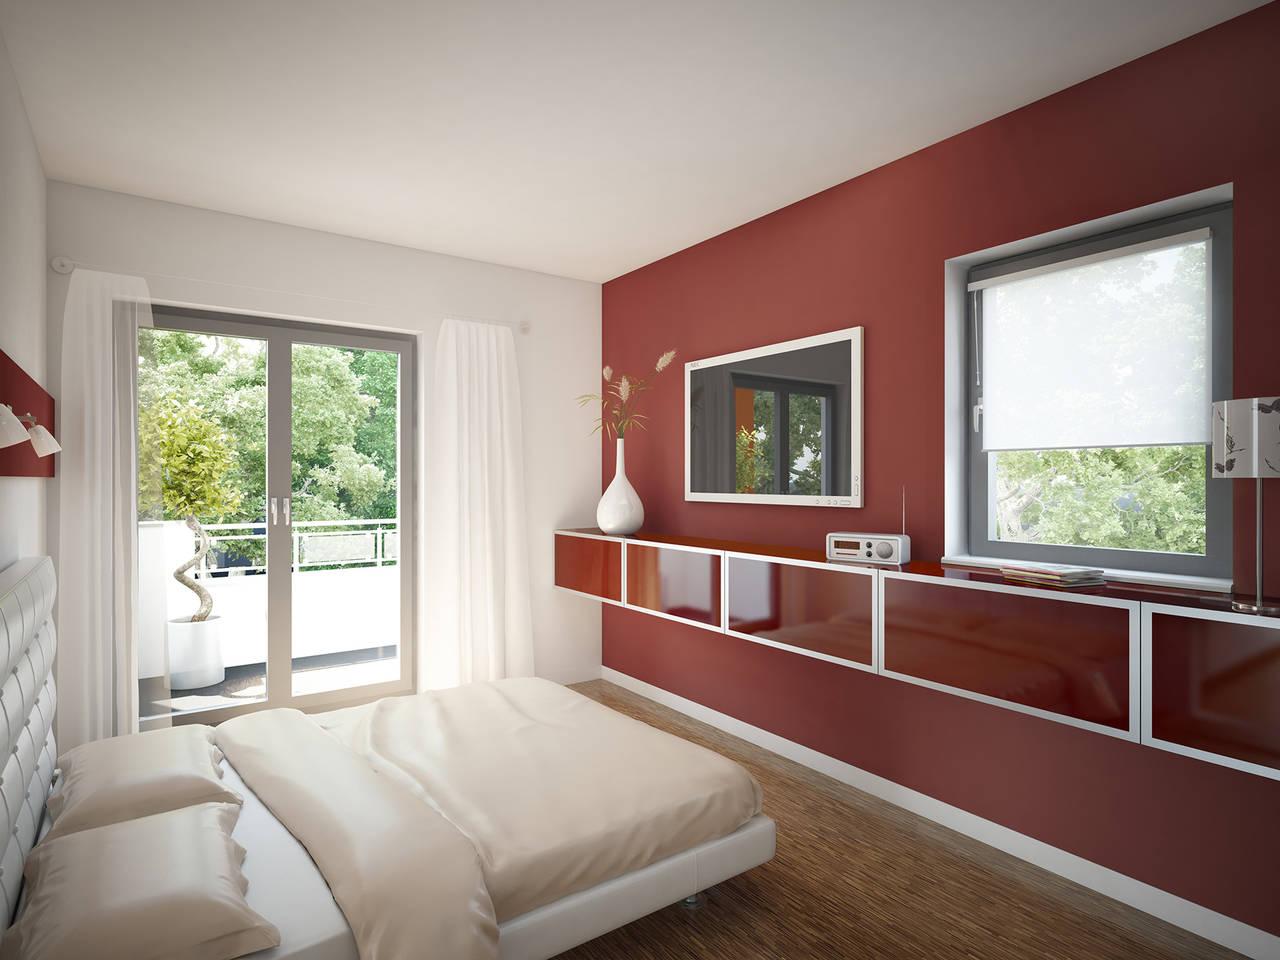 Bien-Zenker Evolution 135 V2 Einfamilienhaus Schlafzimmer